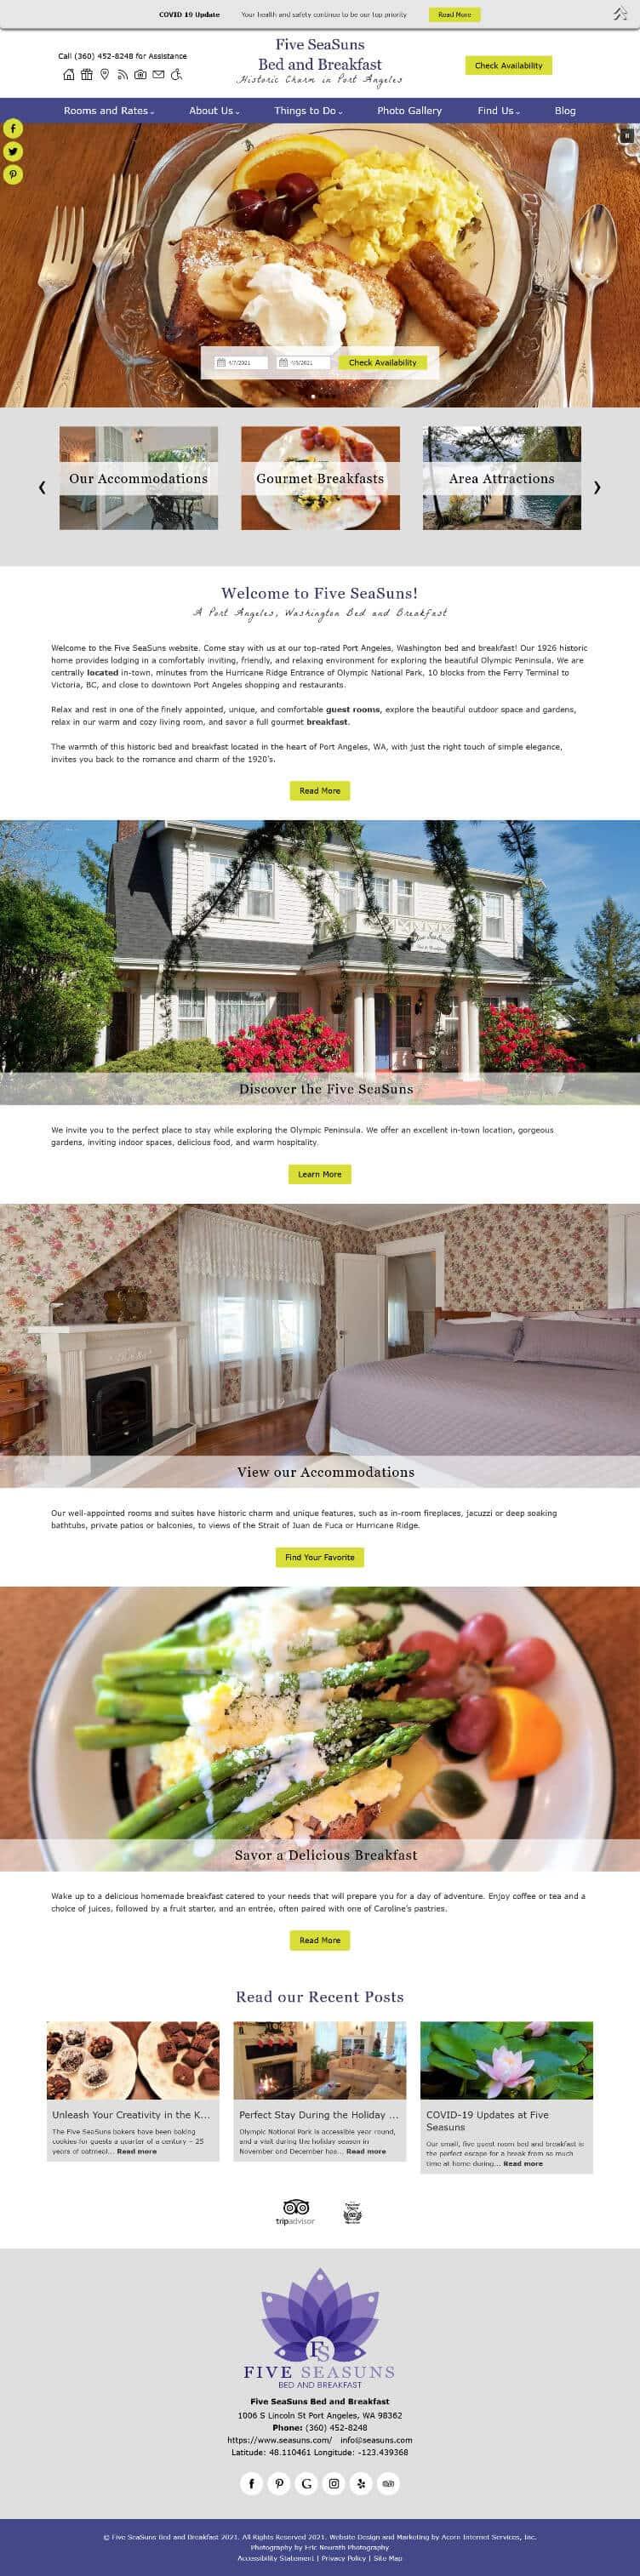 Home page screen shot of Five Seasuns